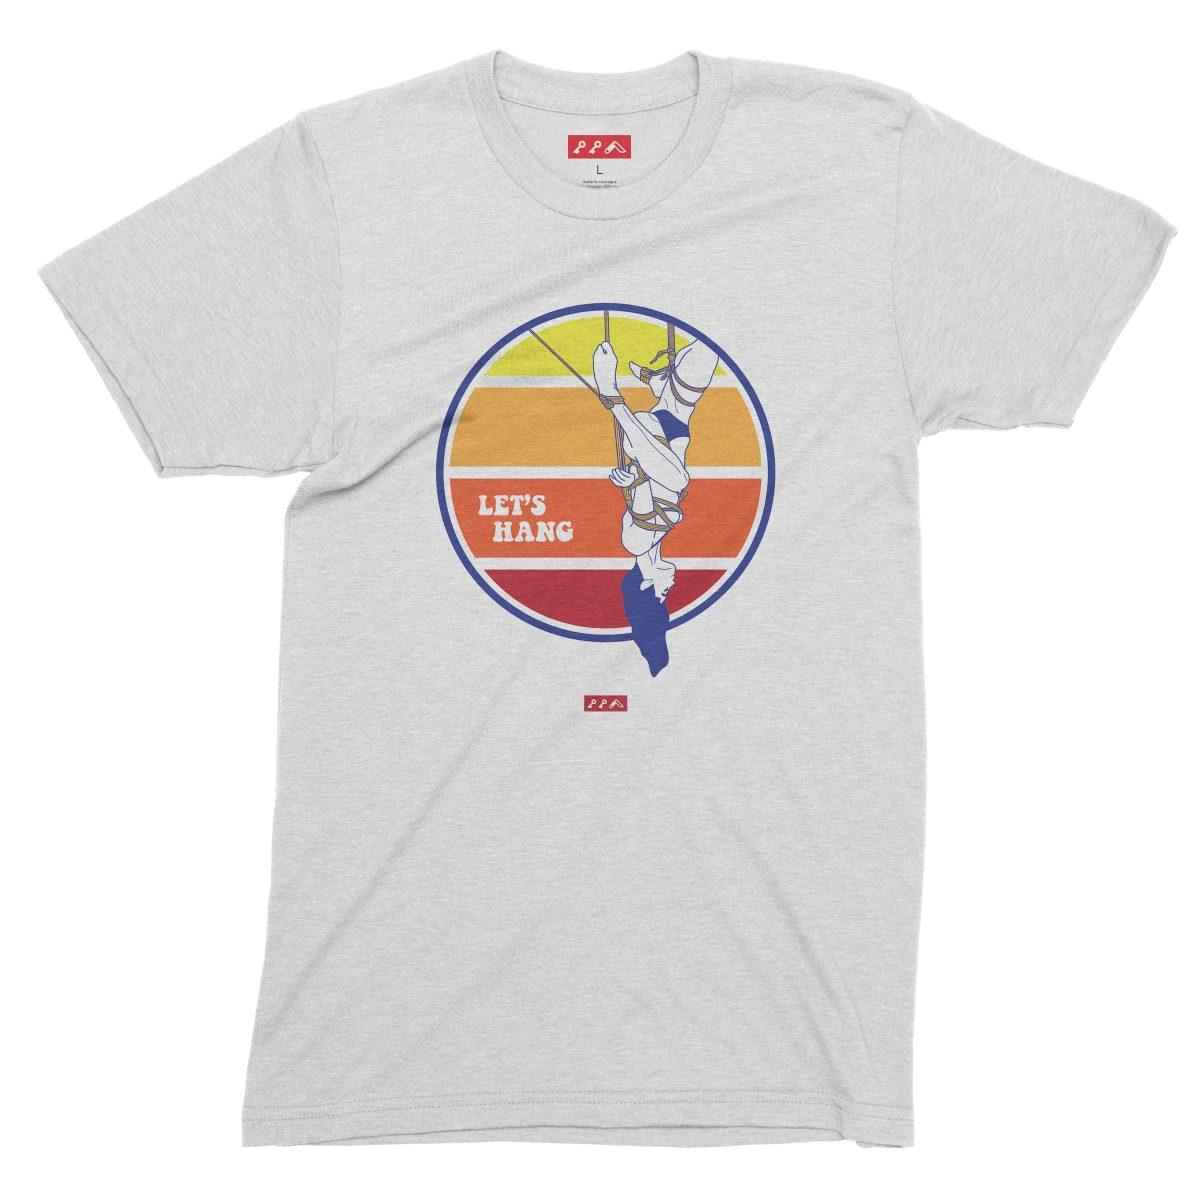 LET'S HANG shibari bondage shirt in white fleck tri-blend